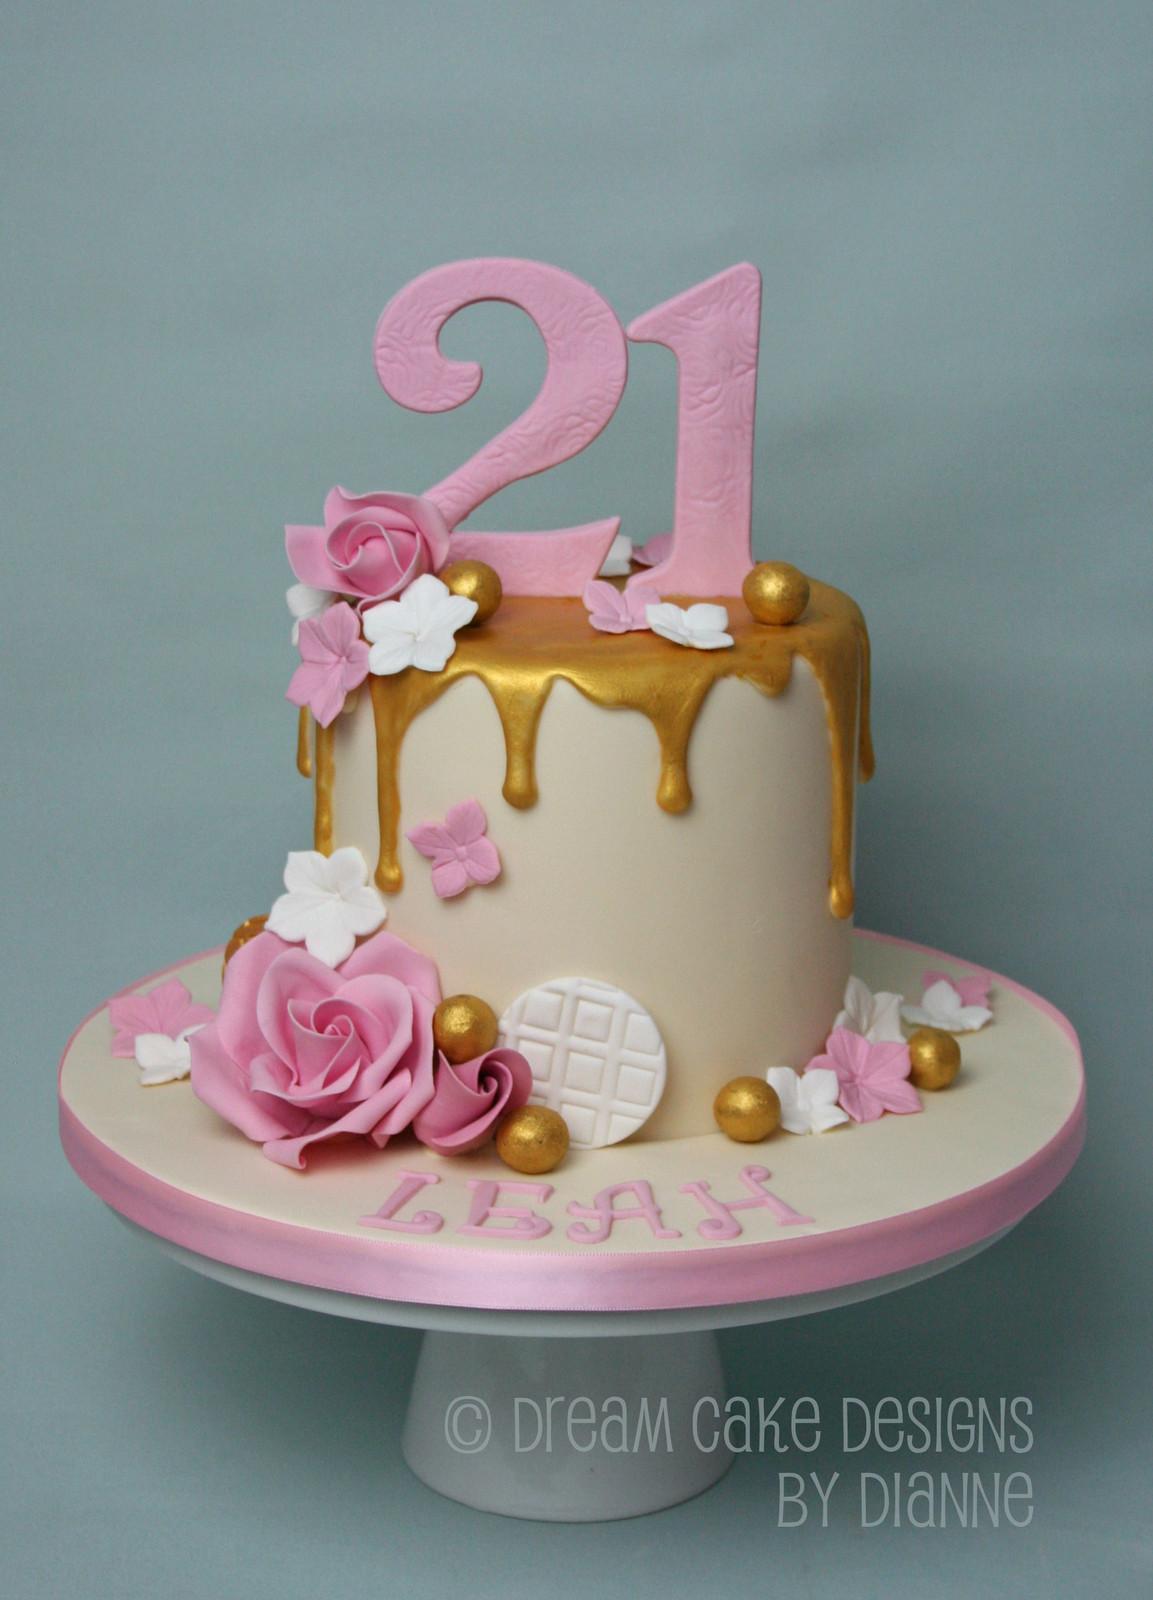 Swell Leah 21St Birthday Gold Drip Roses Funny Birthday Cards Online Alyptdamsfinfo